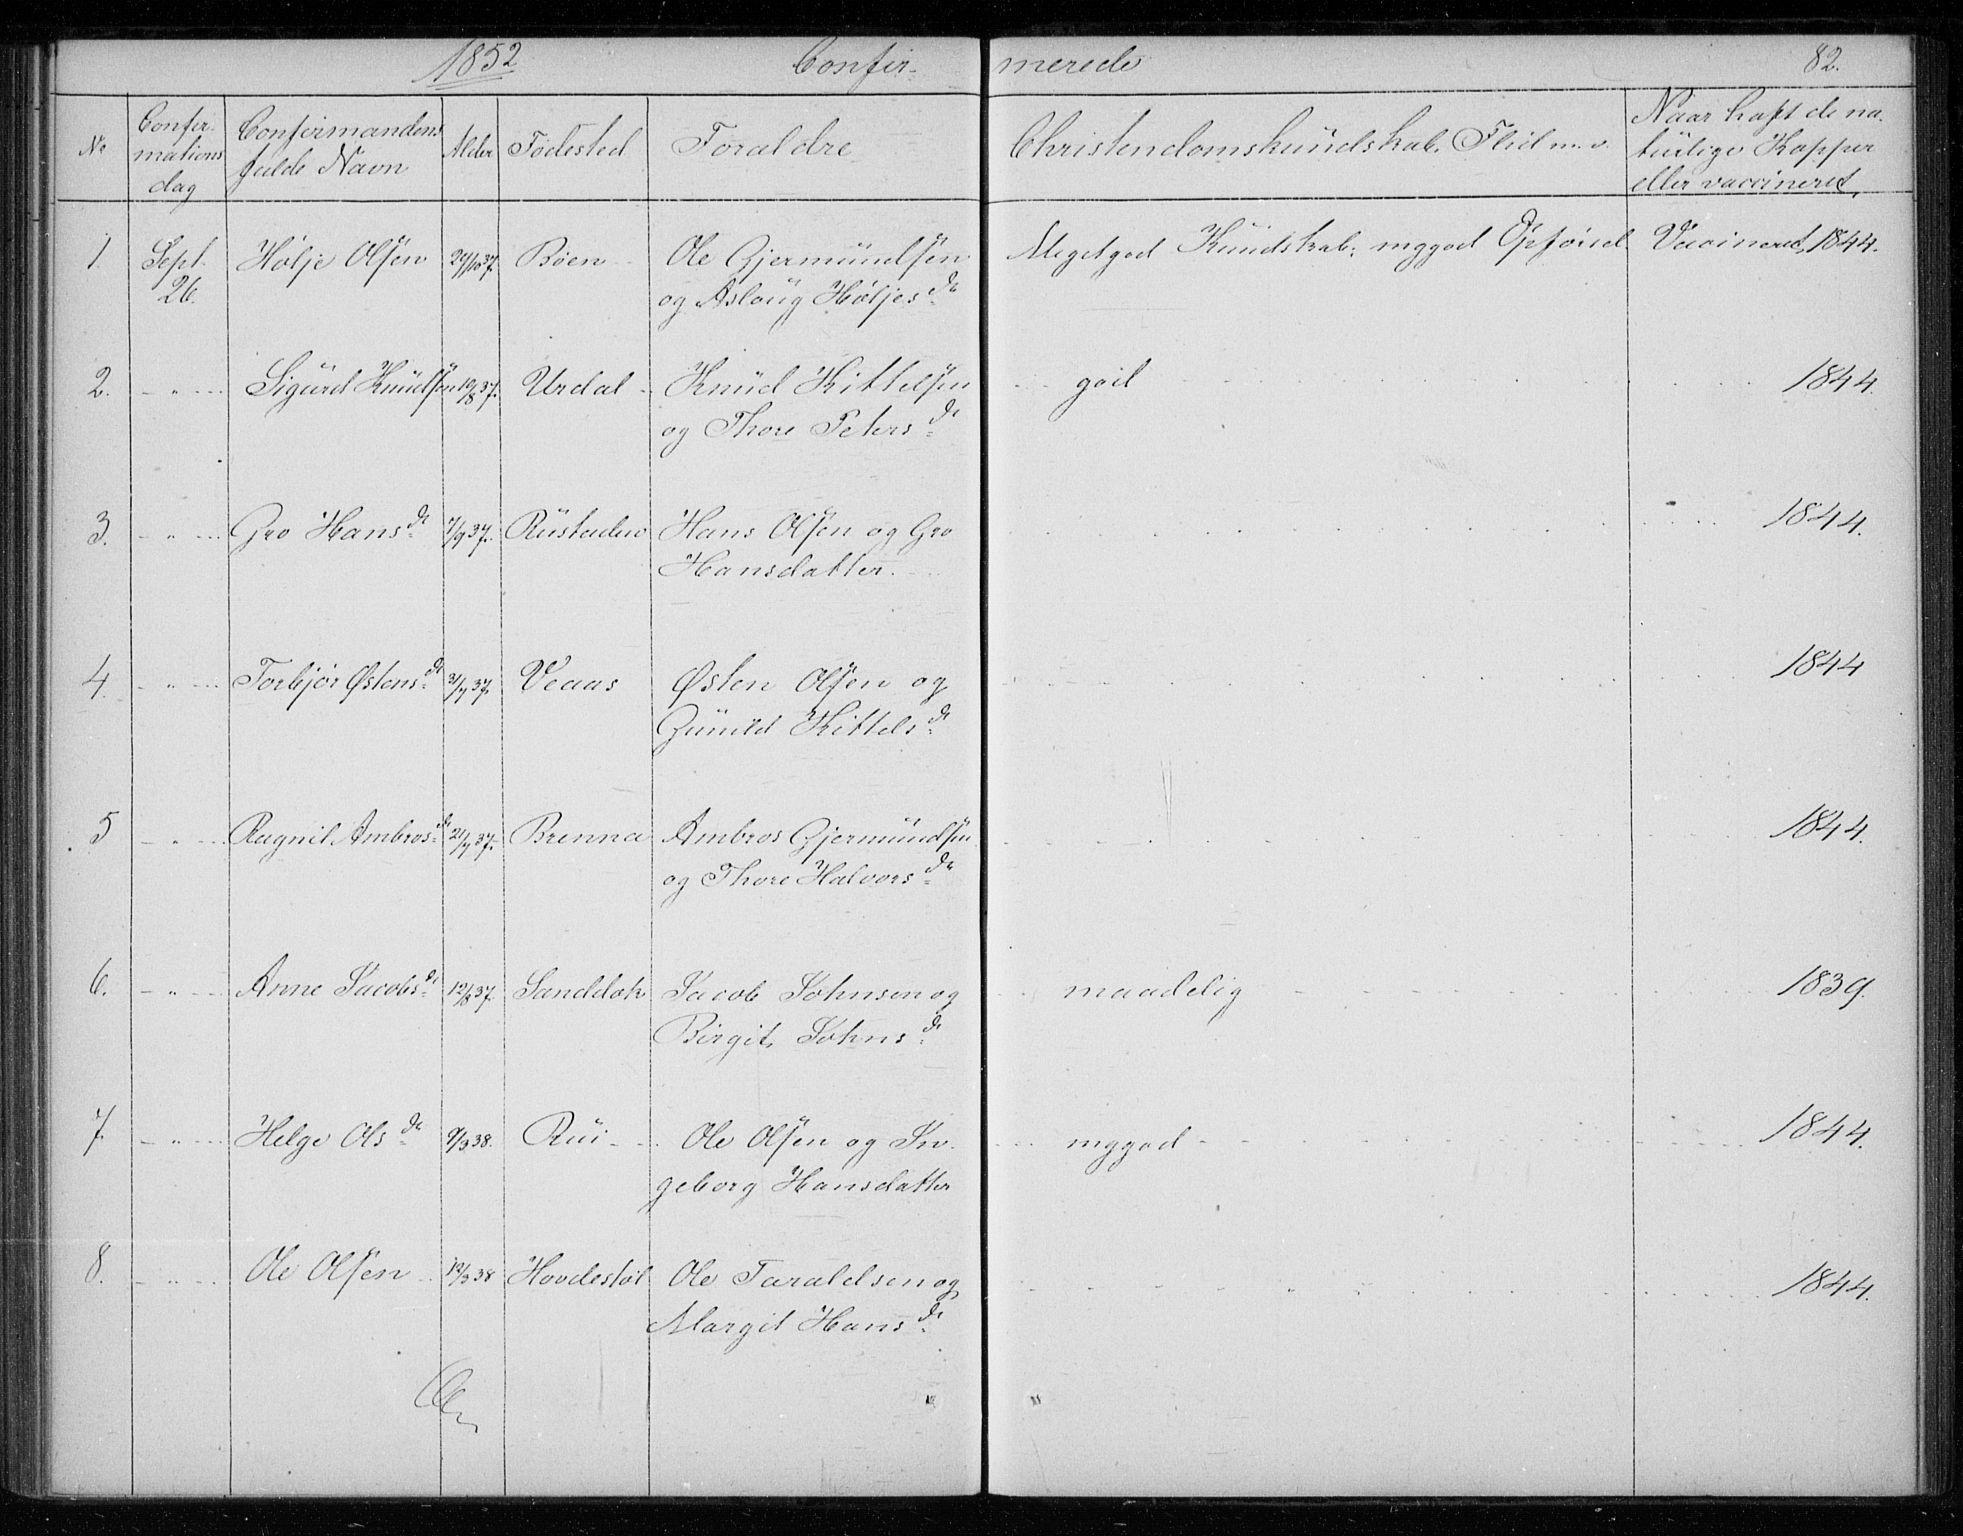 SAKO, Gransherad kirkebøker, F/Fb/L0003: Ministerialbok nr. II 3, 1844-1859, s. 82